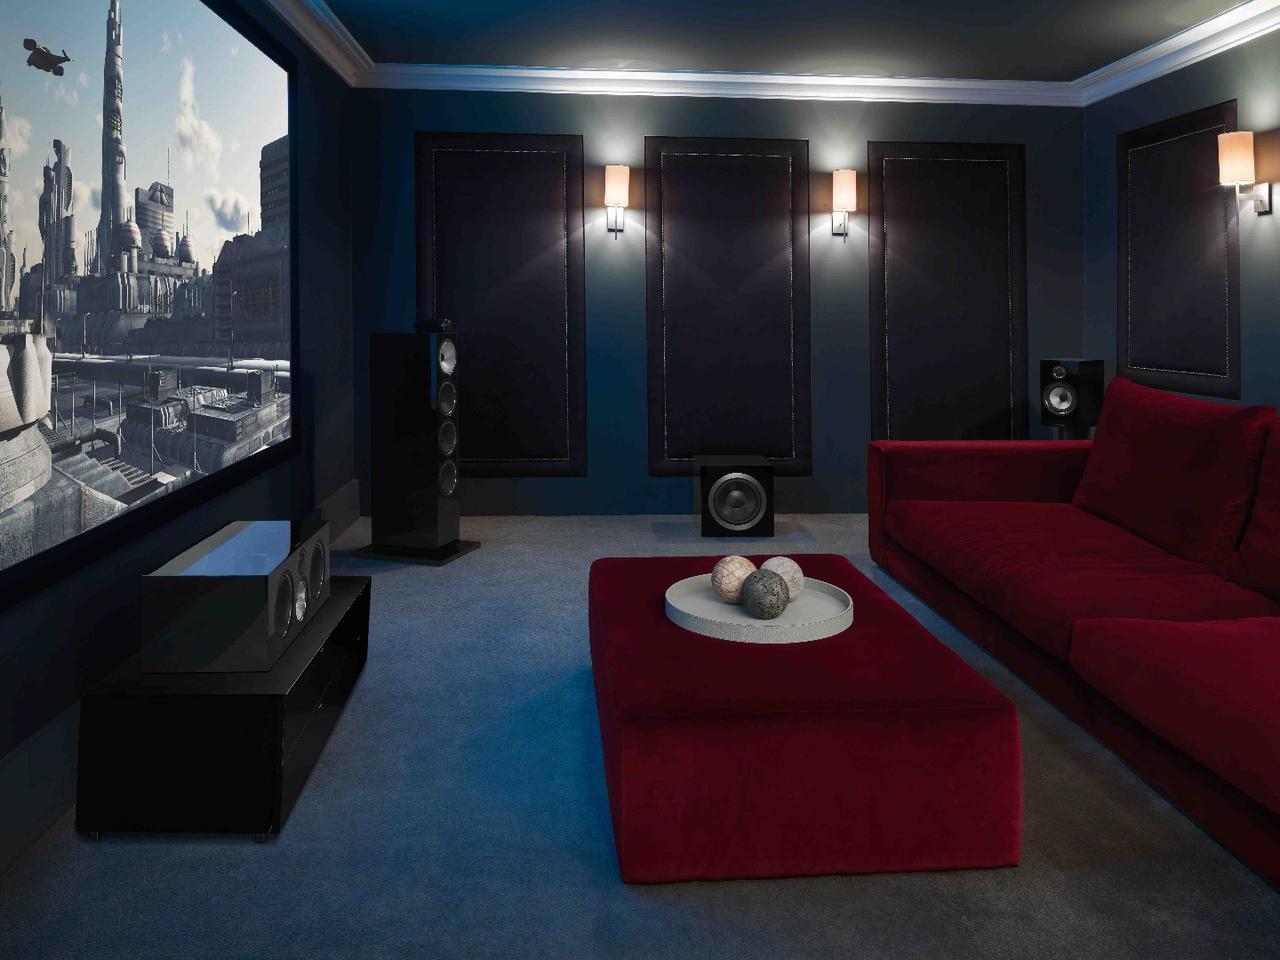 Bowers & Wilkins 700 Series speakers used in a home cinema setup